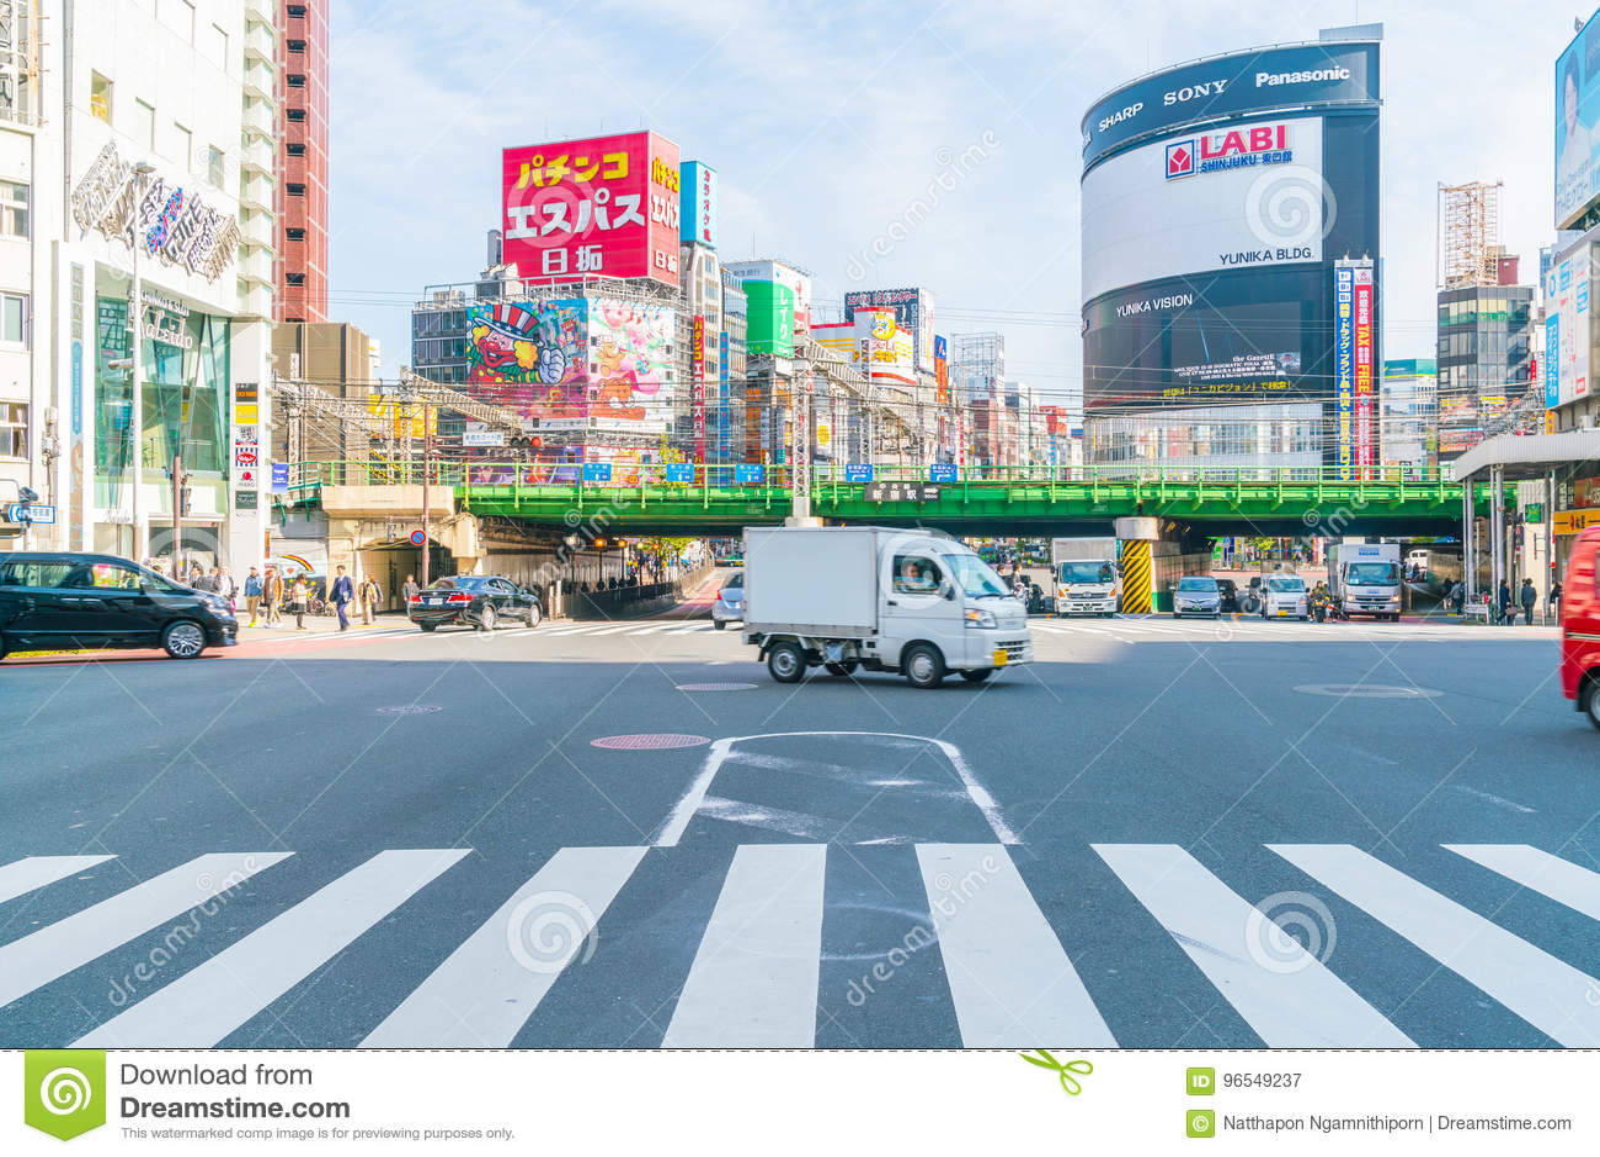 TOKYO , JAPAN - 2016 Nov 17 : Shinjuku is one of Tokyo s busine